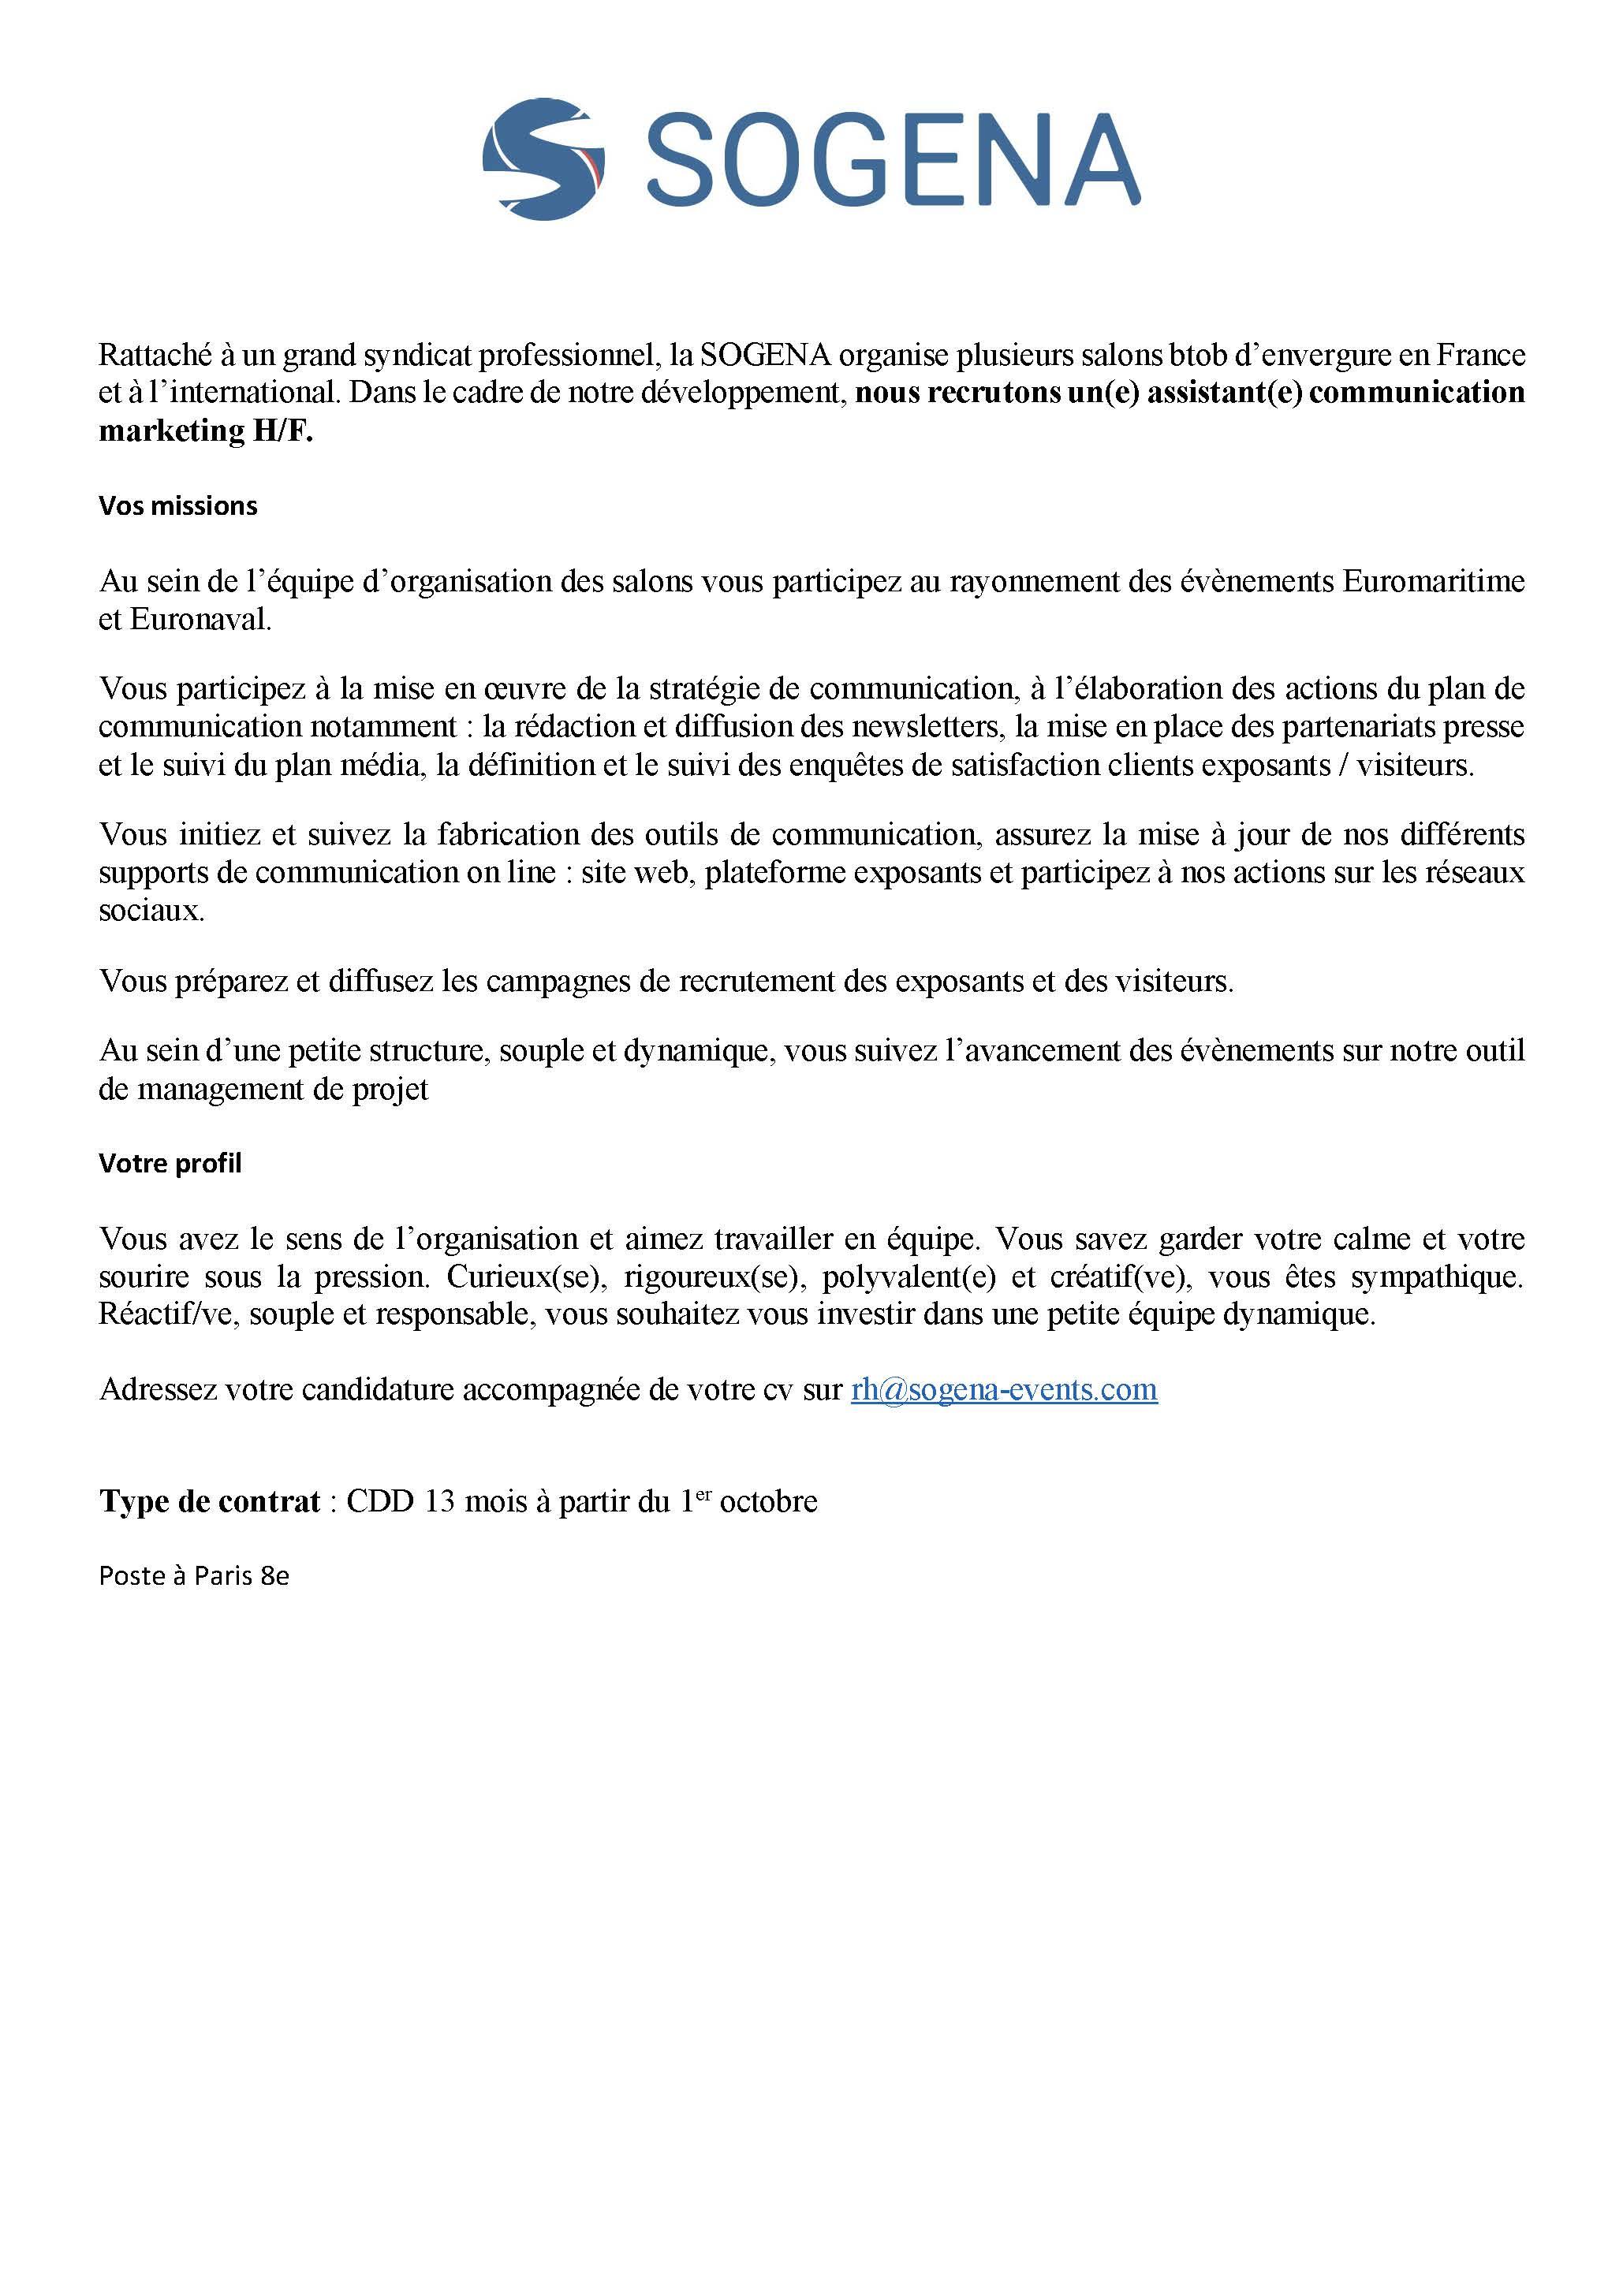 offre emploi - SOGENA assistante communication